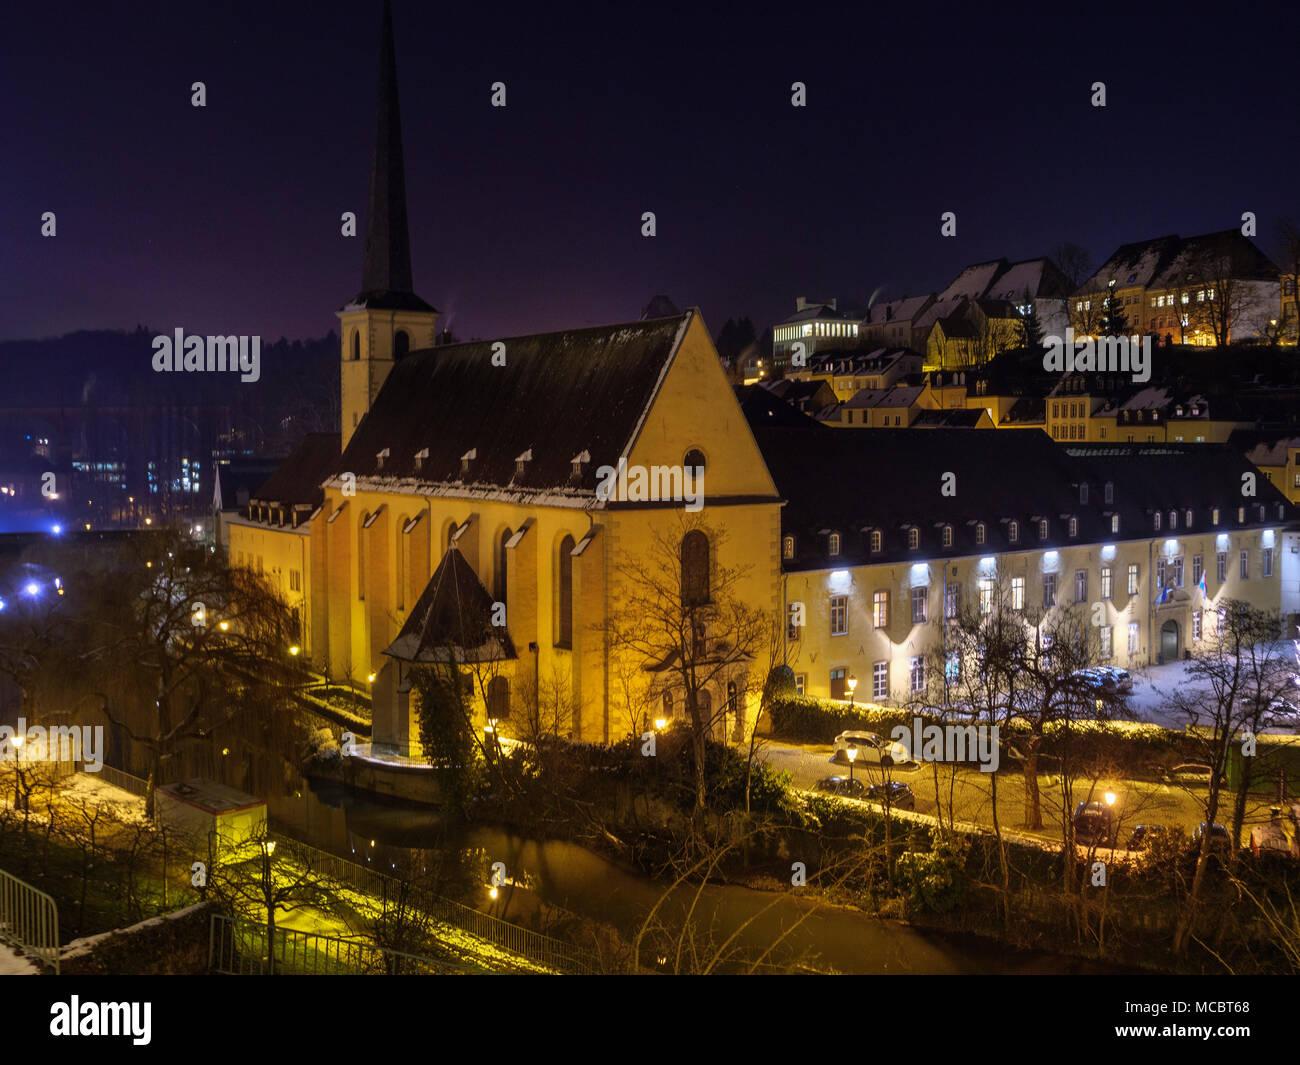 Abtei Neumünster, Wengen, der Stadt Luxemburg, Europa, UNESCO HeritageHeritag Stockbild